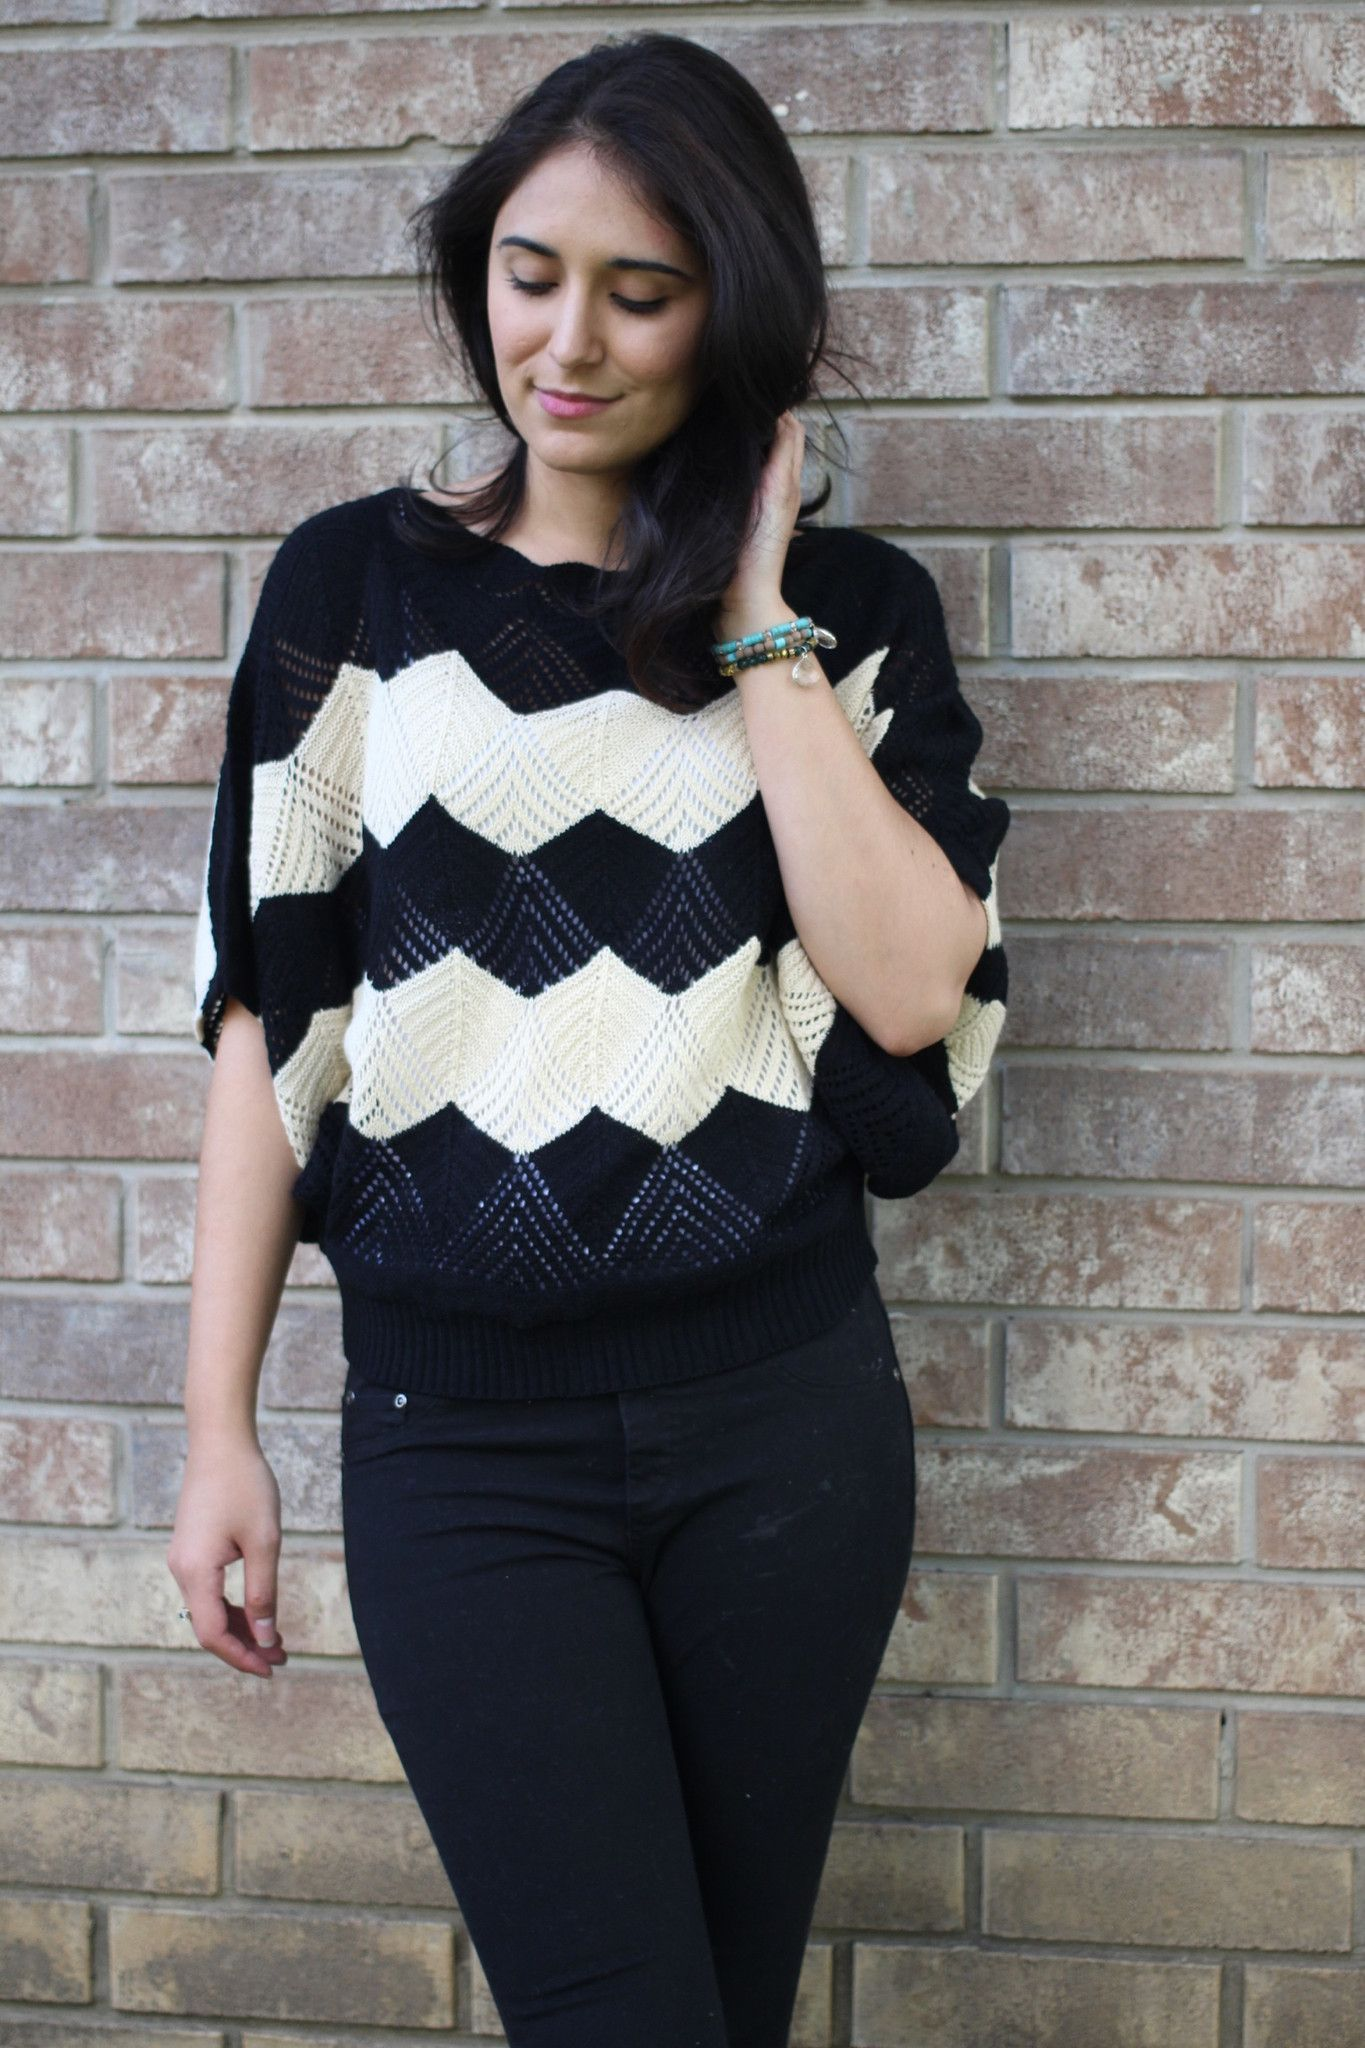 Chevron bat sweater